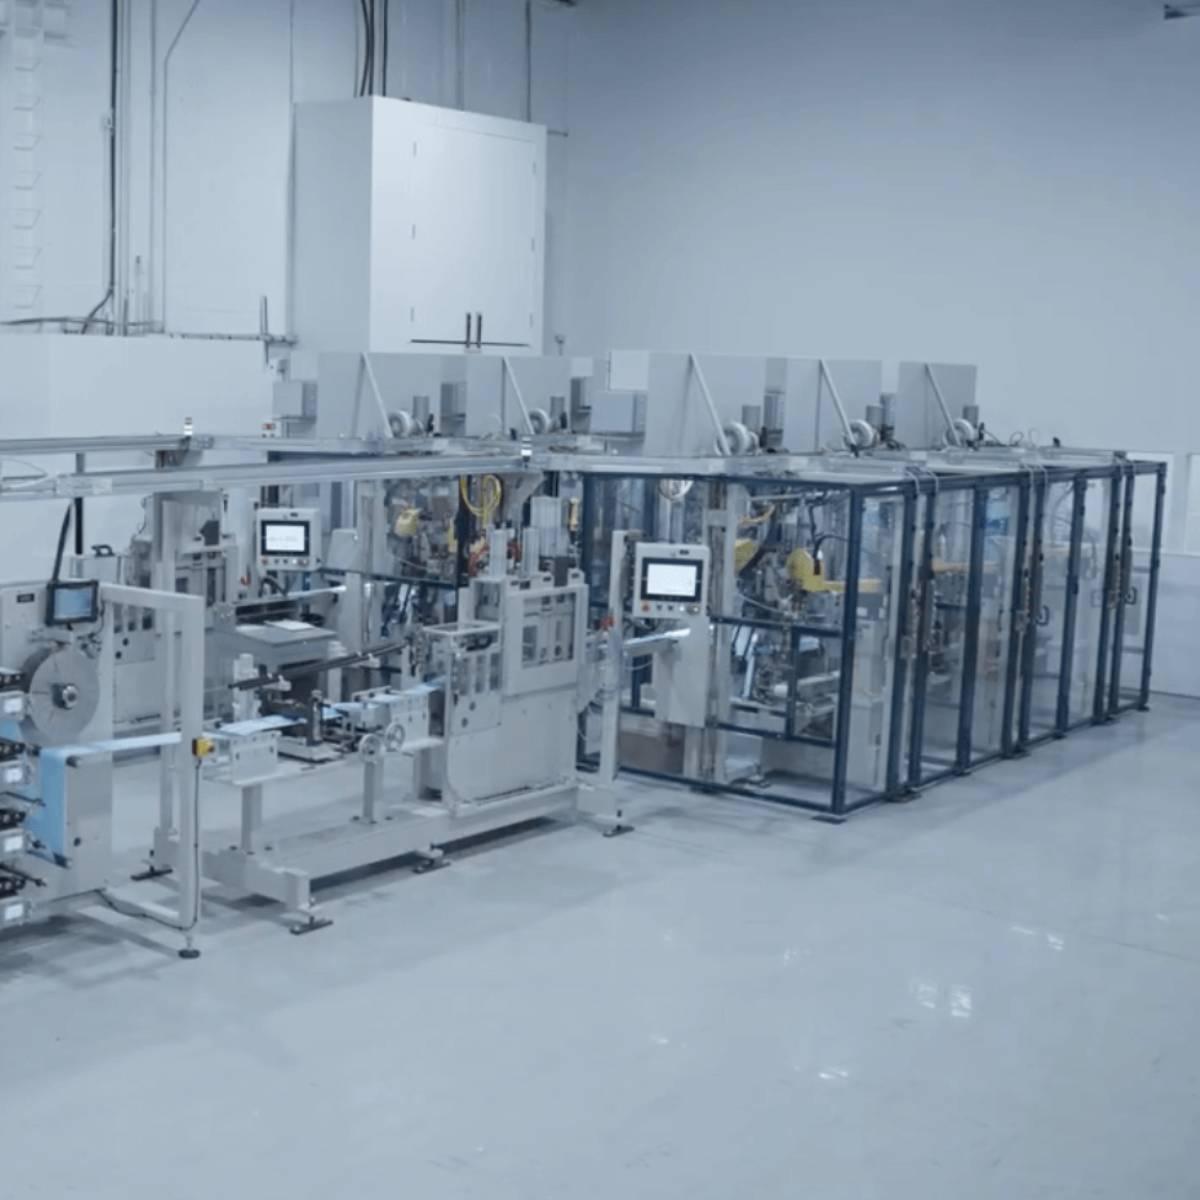 Robot safety enclosure